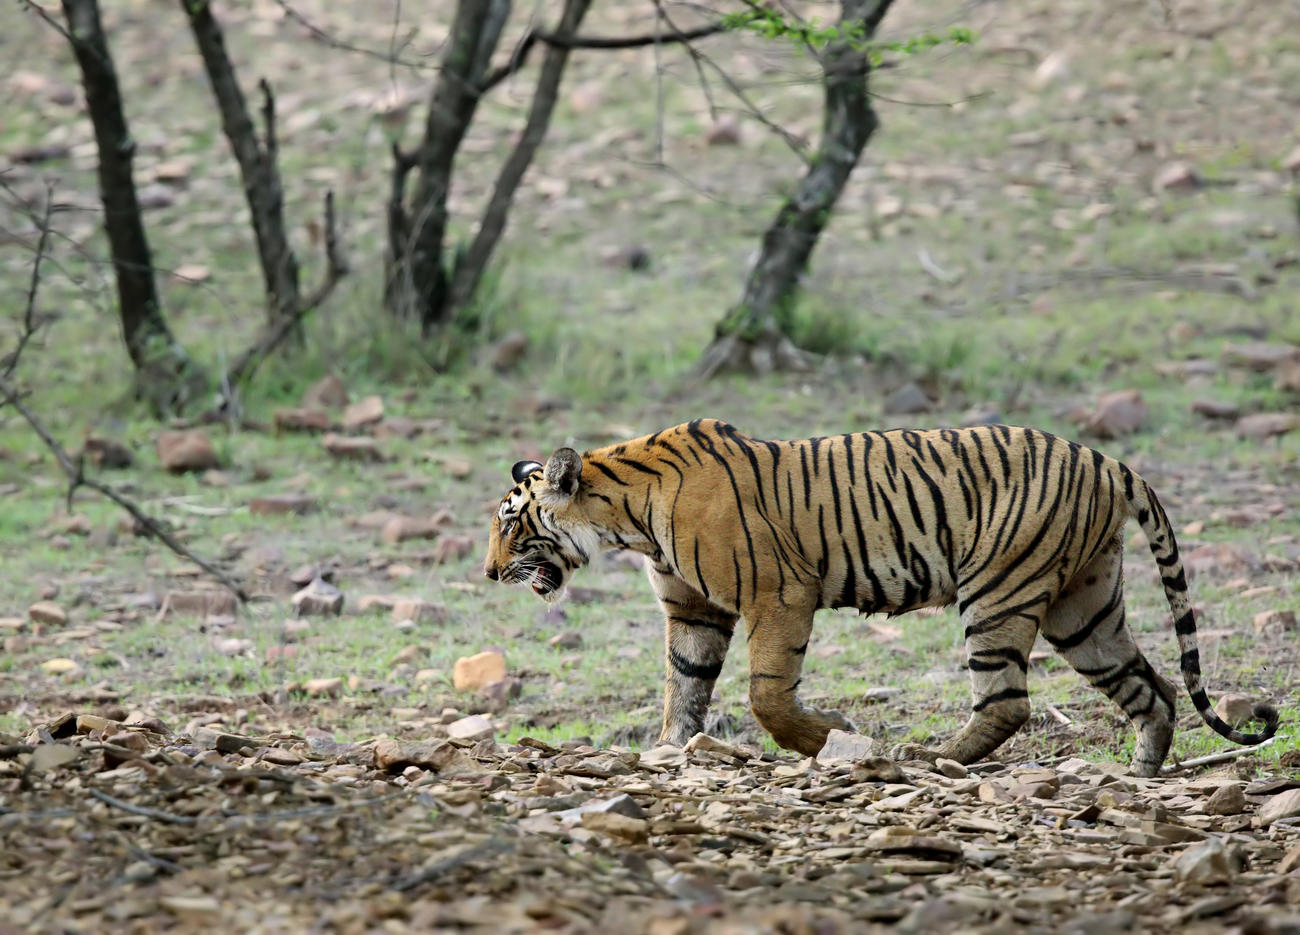 Spot tigers when visiting Ranthambore